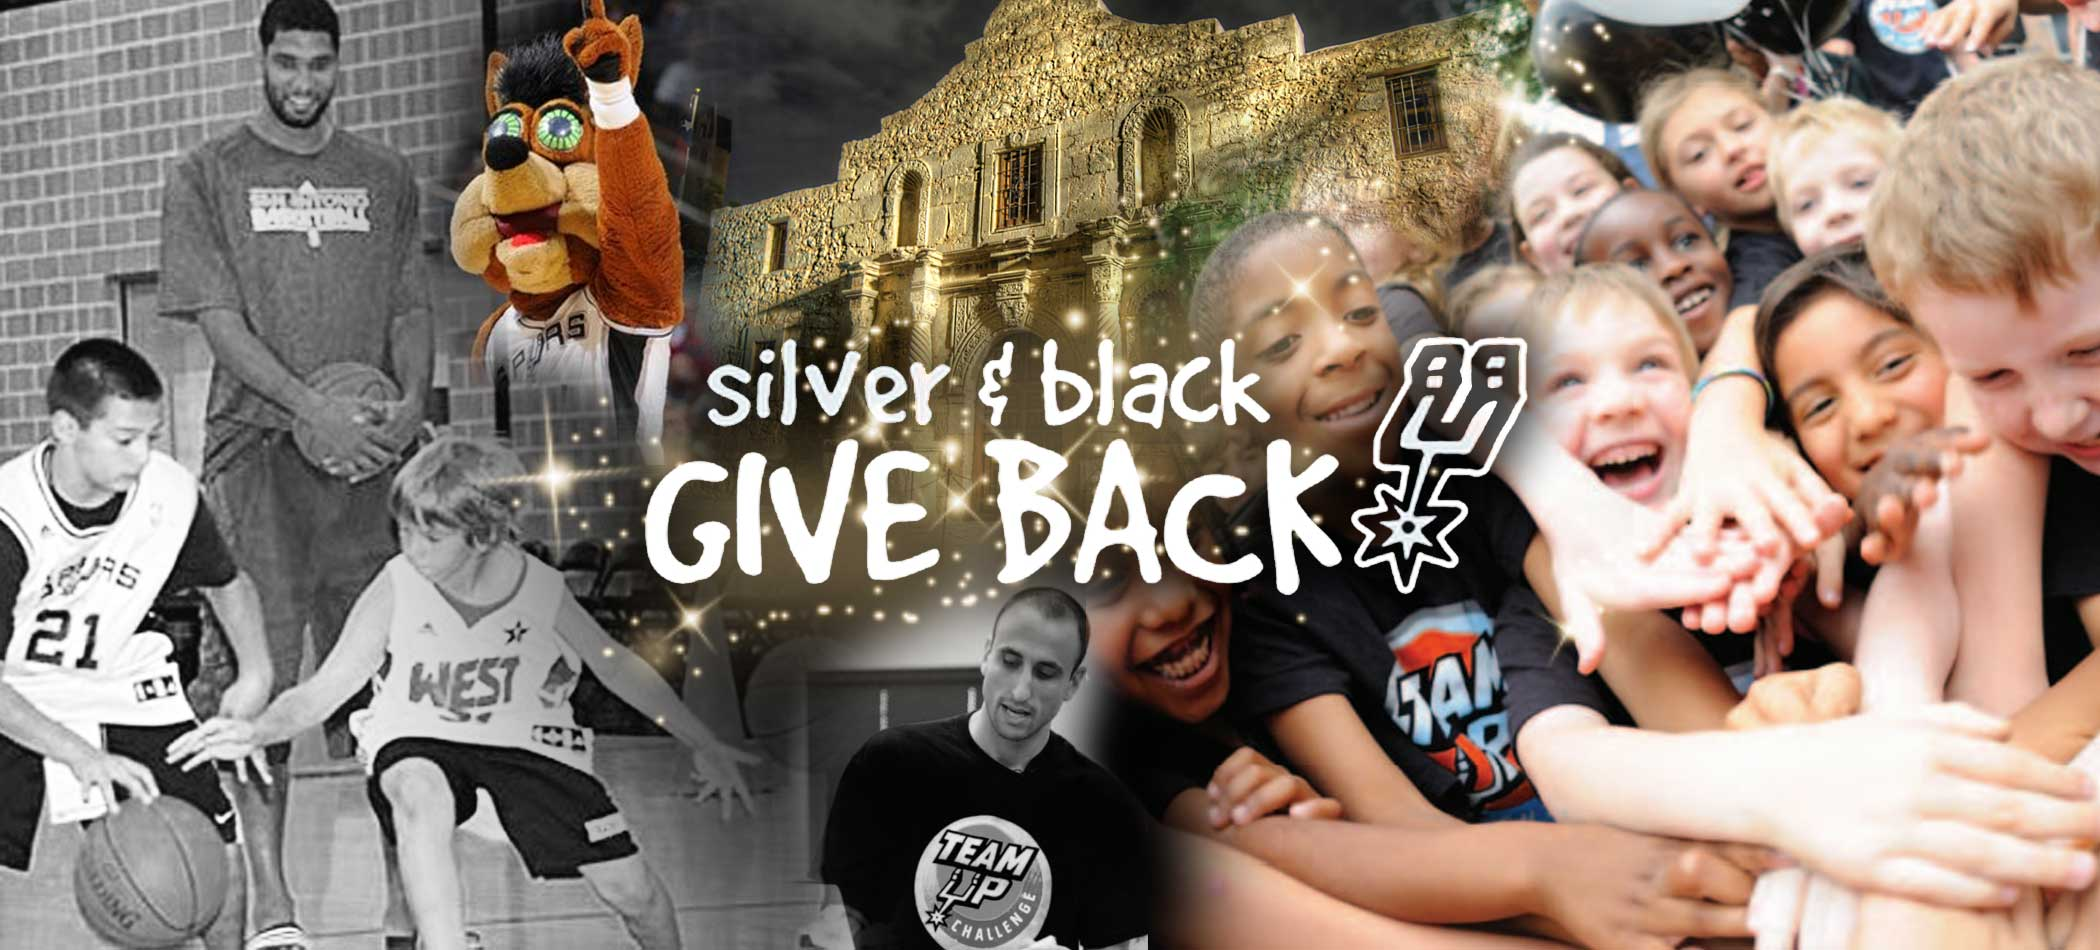 GiveBackSilverBlack.jpg